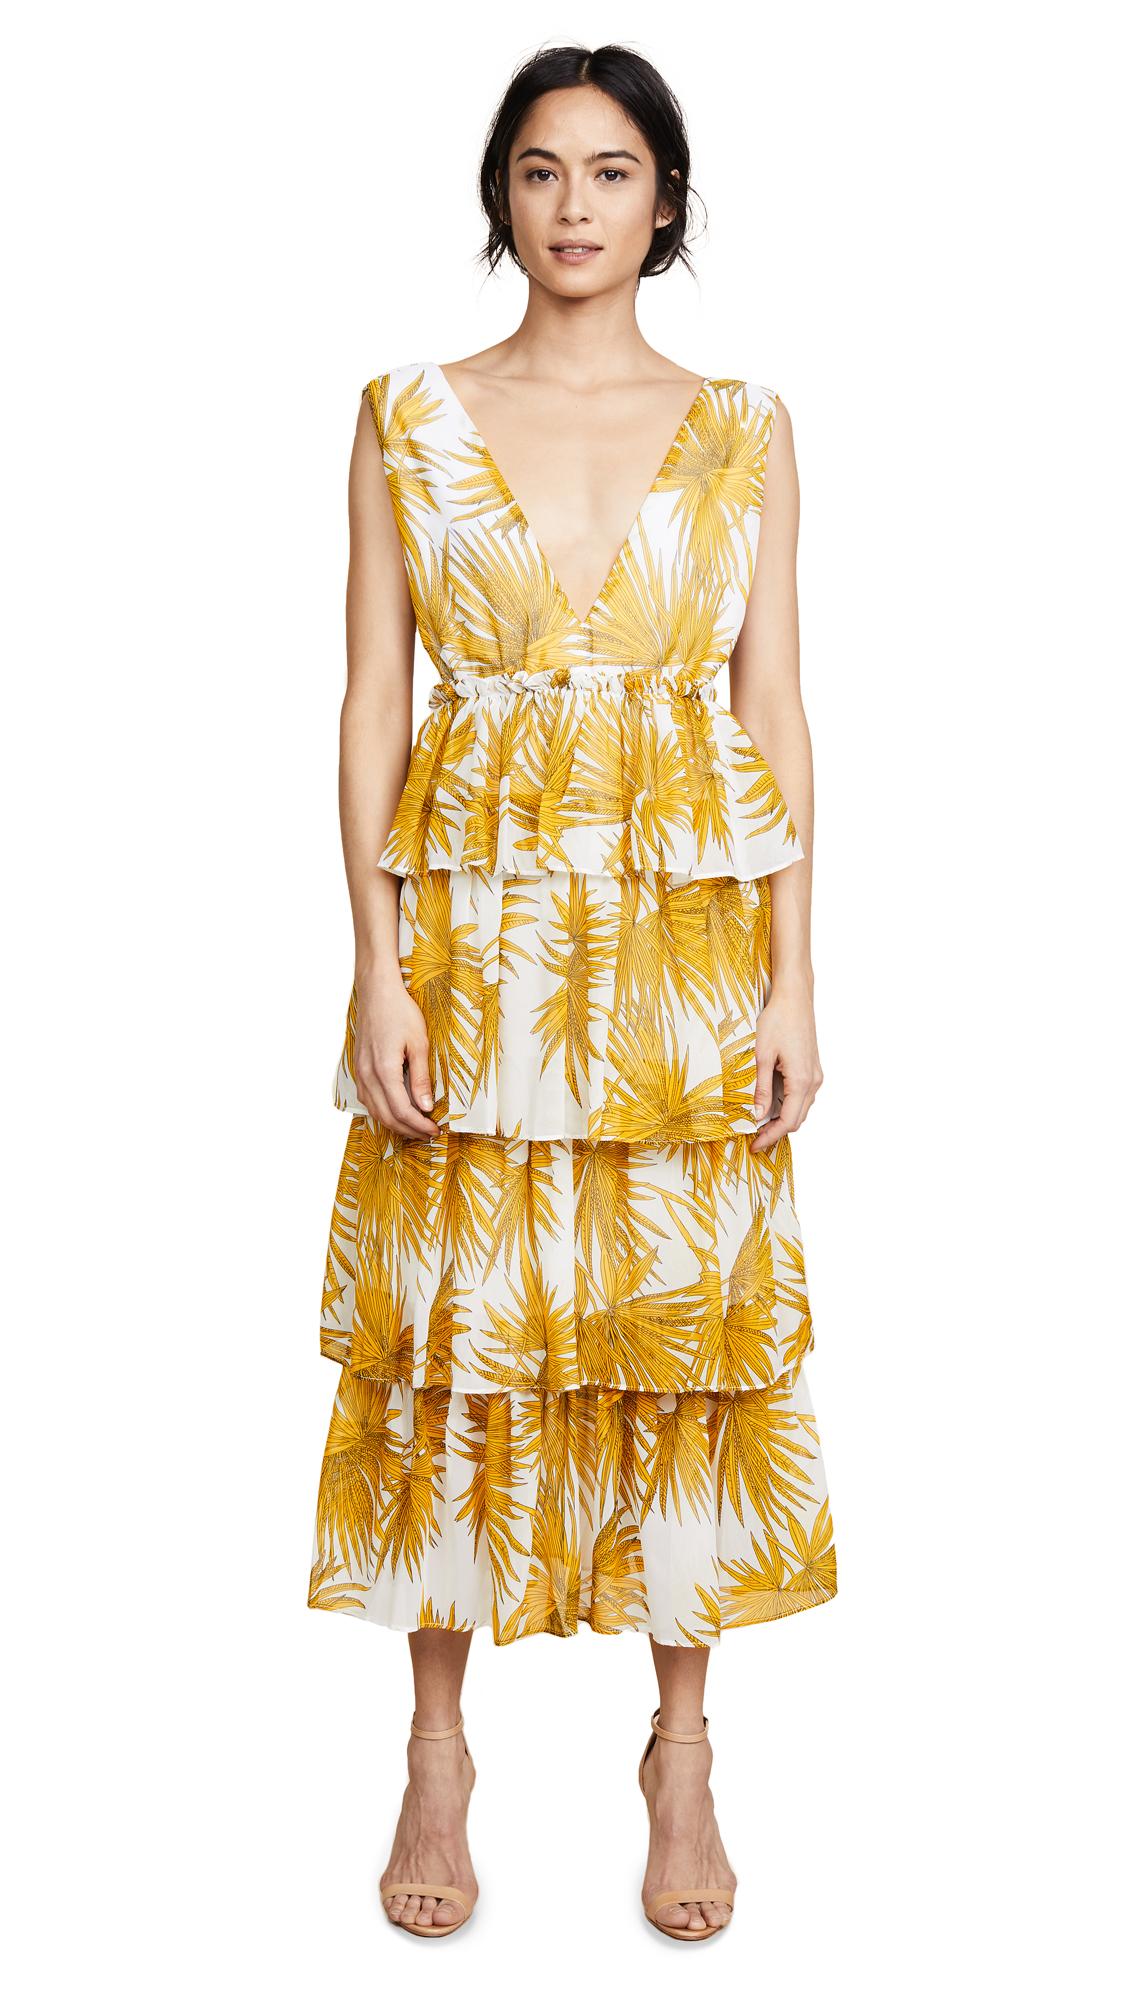 NIGHTWALKER The Georgina Dress in Gold/Off White